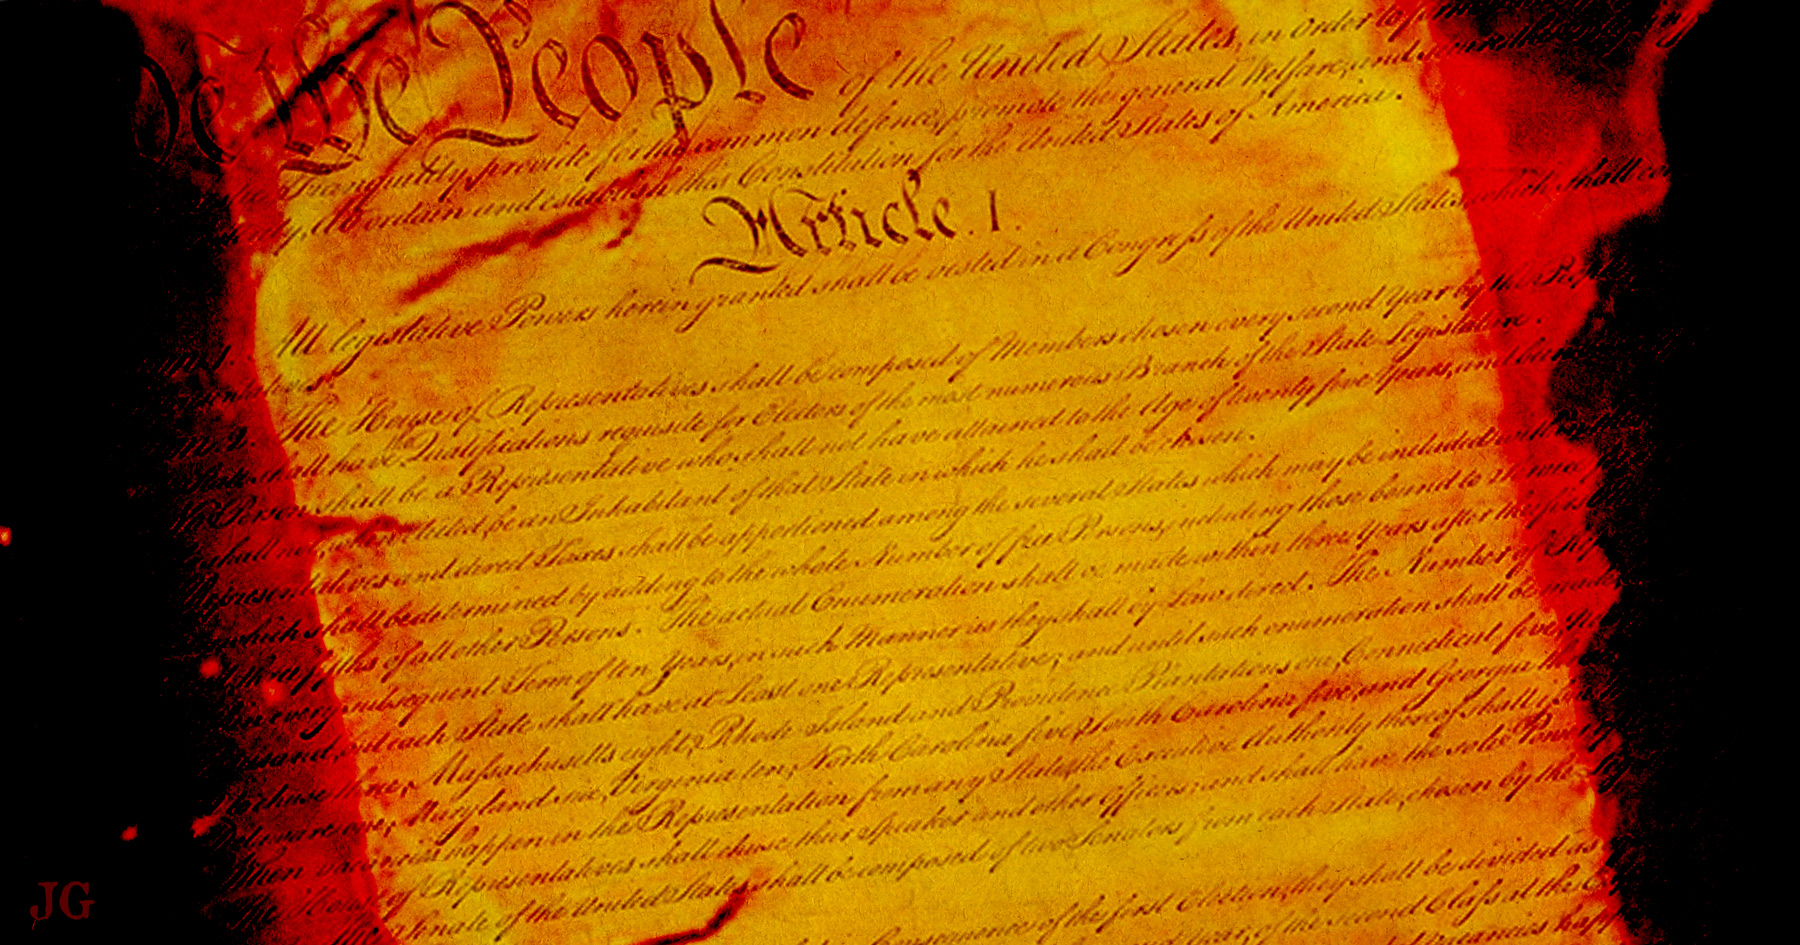 Constitution, Bill of Rights, Politics, Terrorism, populism, Common Sense